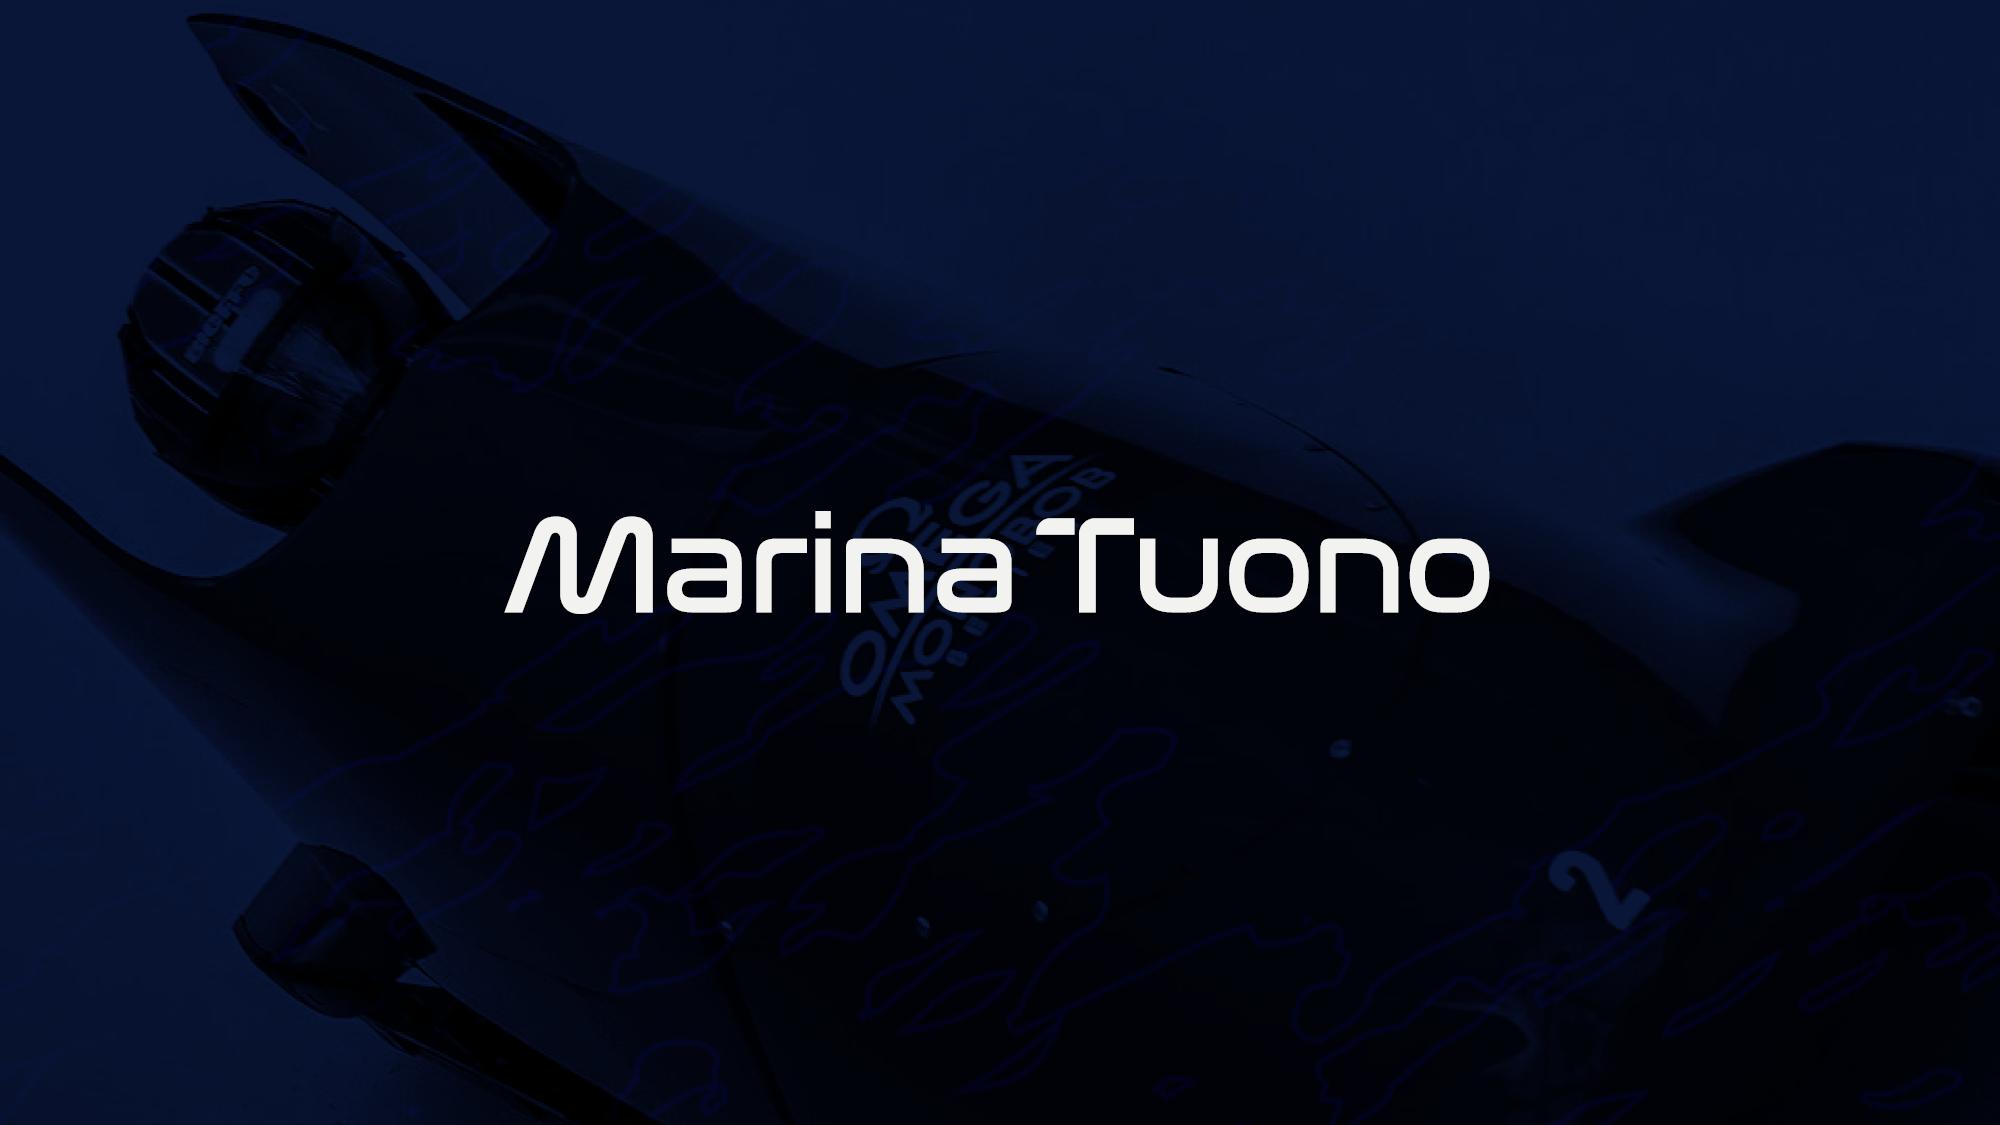 Marina Tuono - Monobob Athlete